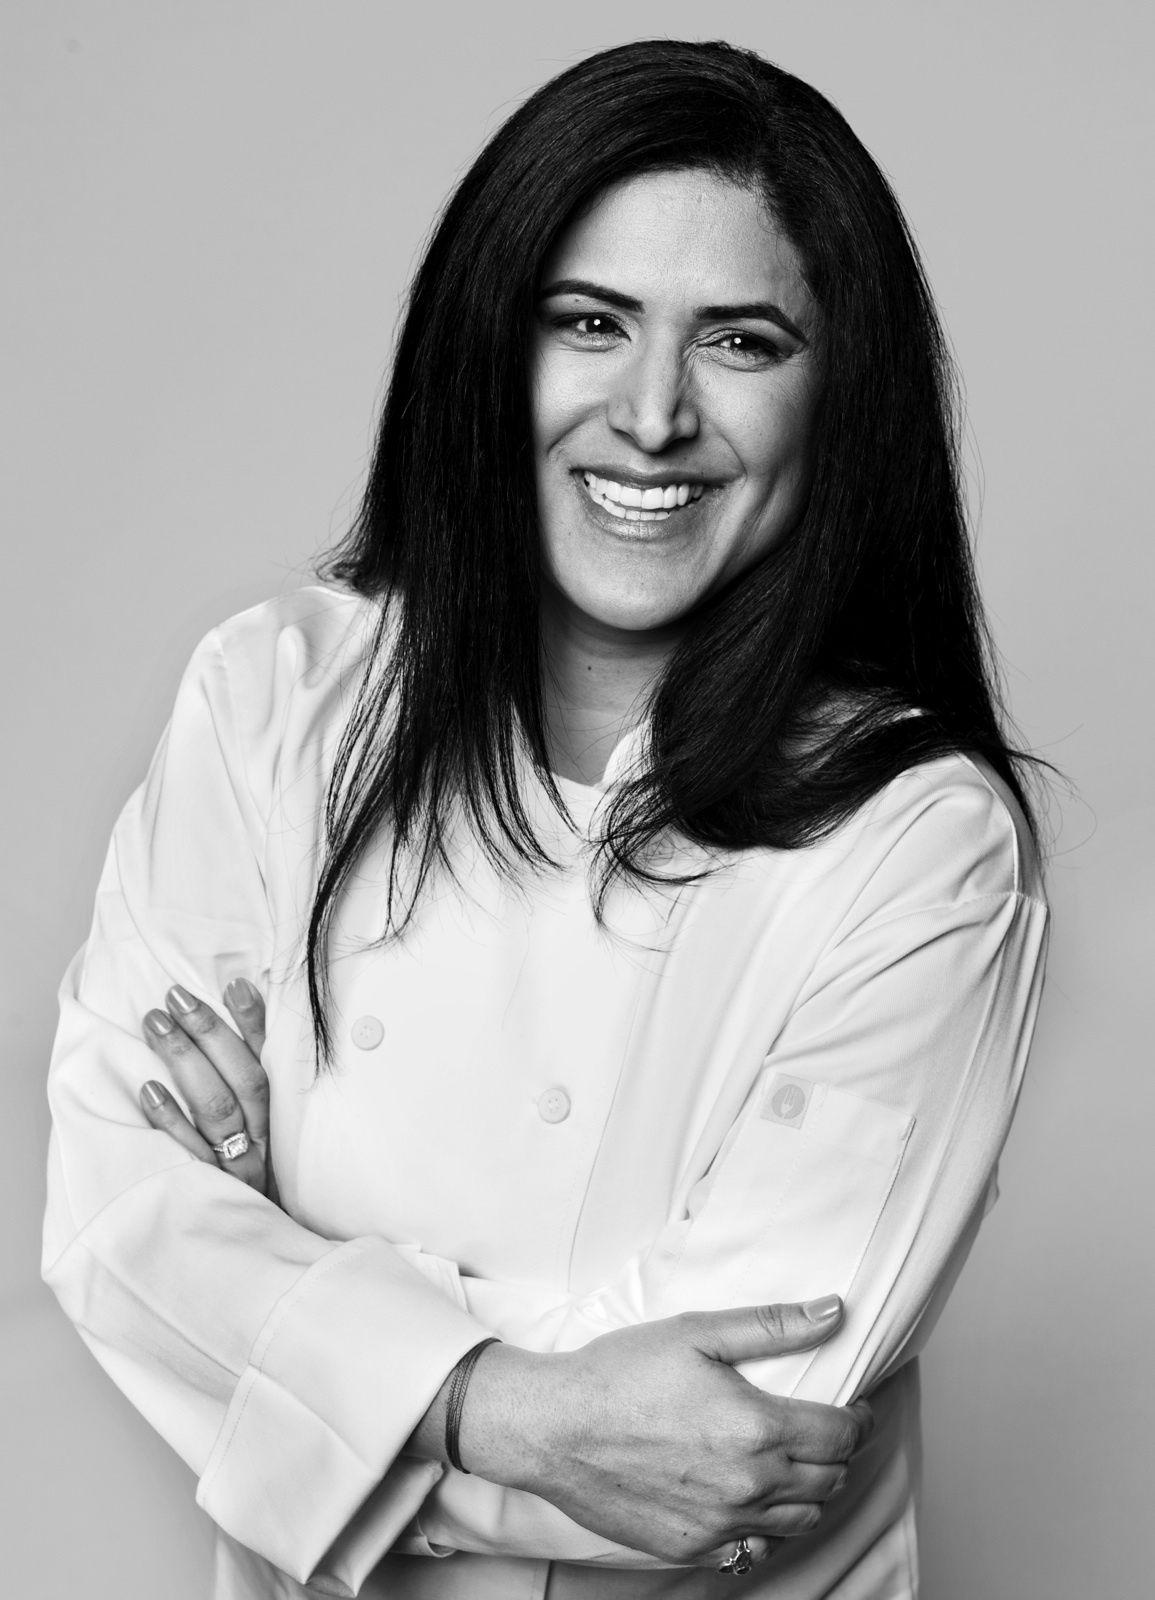 Chef Archna Becker